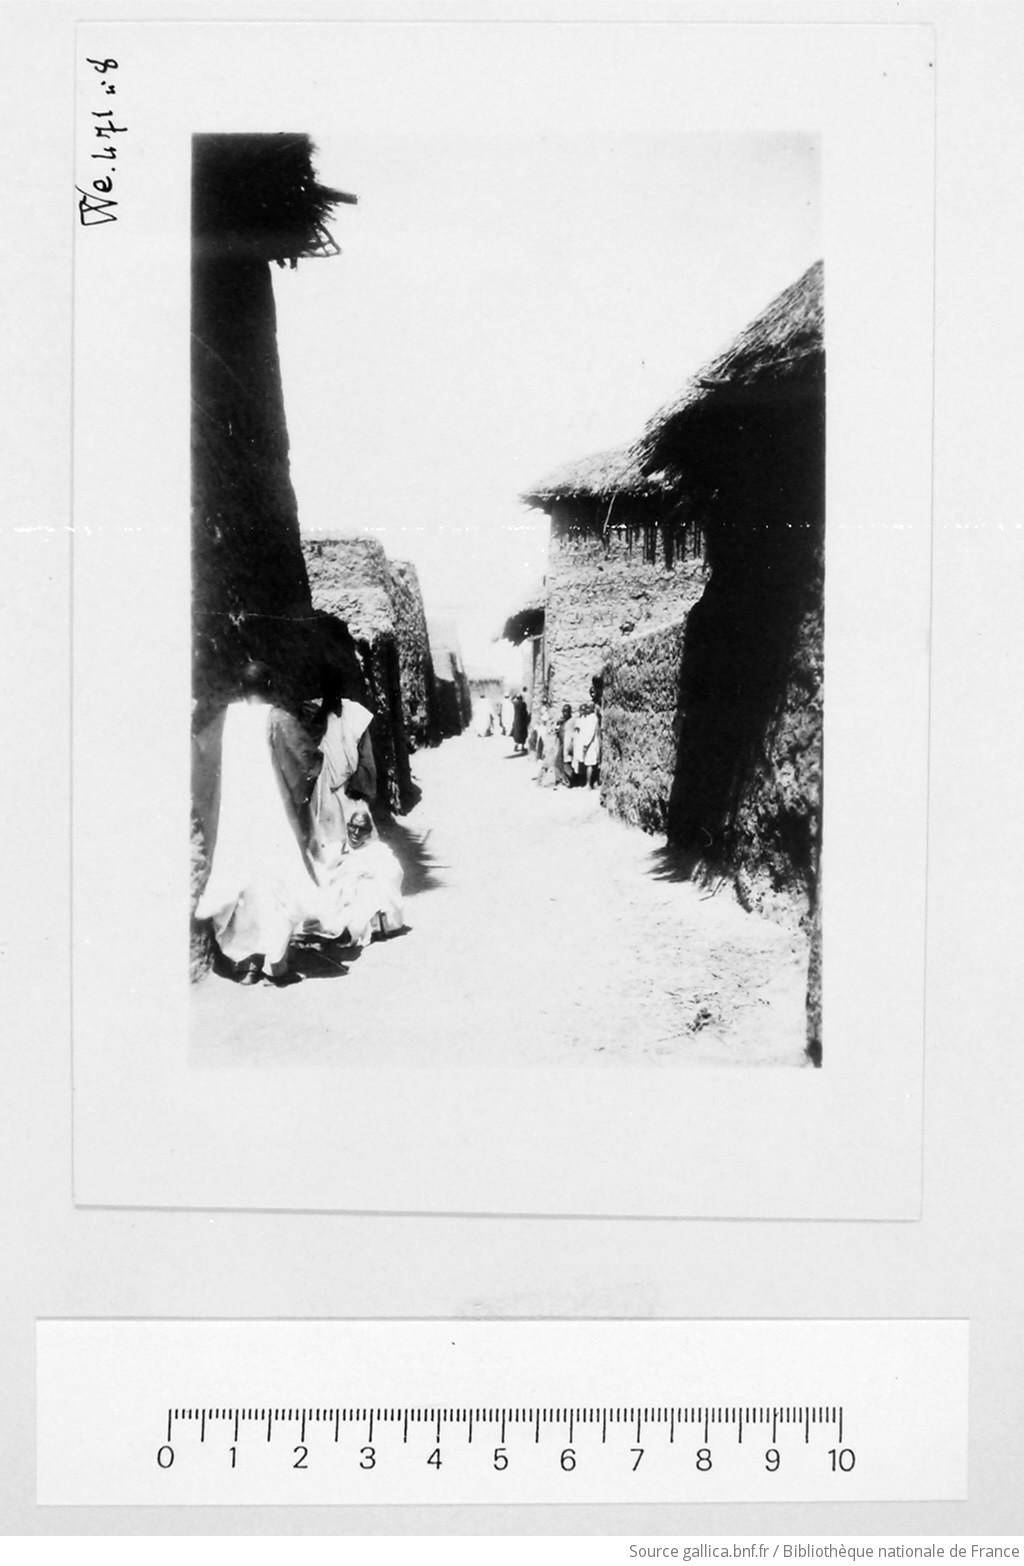 [39 phot. d'A.E.F. en 1924. Enregistré en 1936] - 8